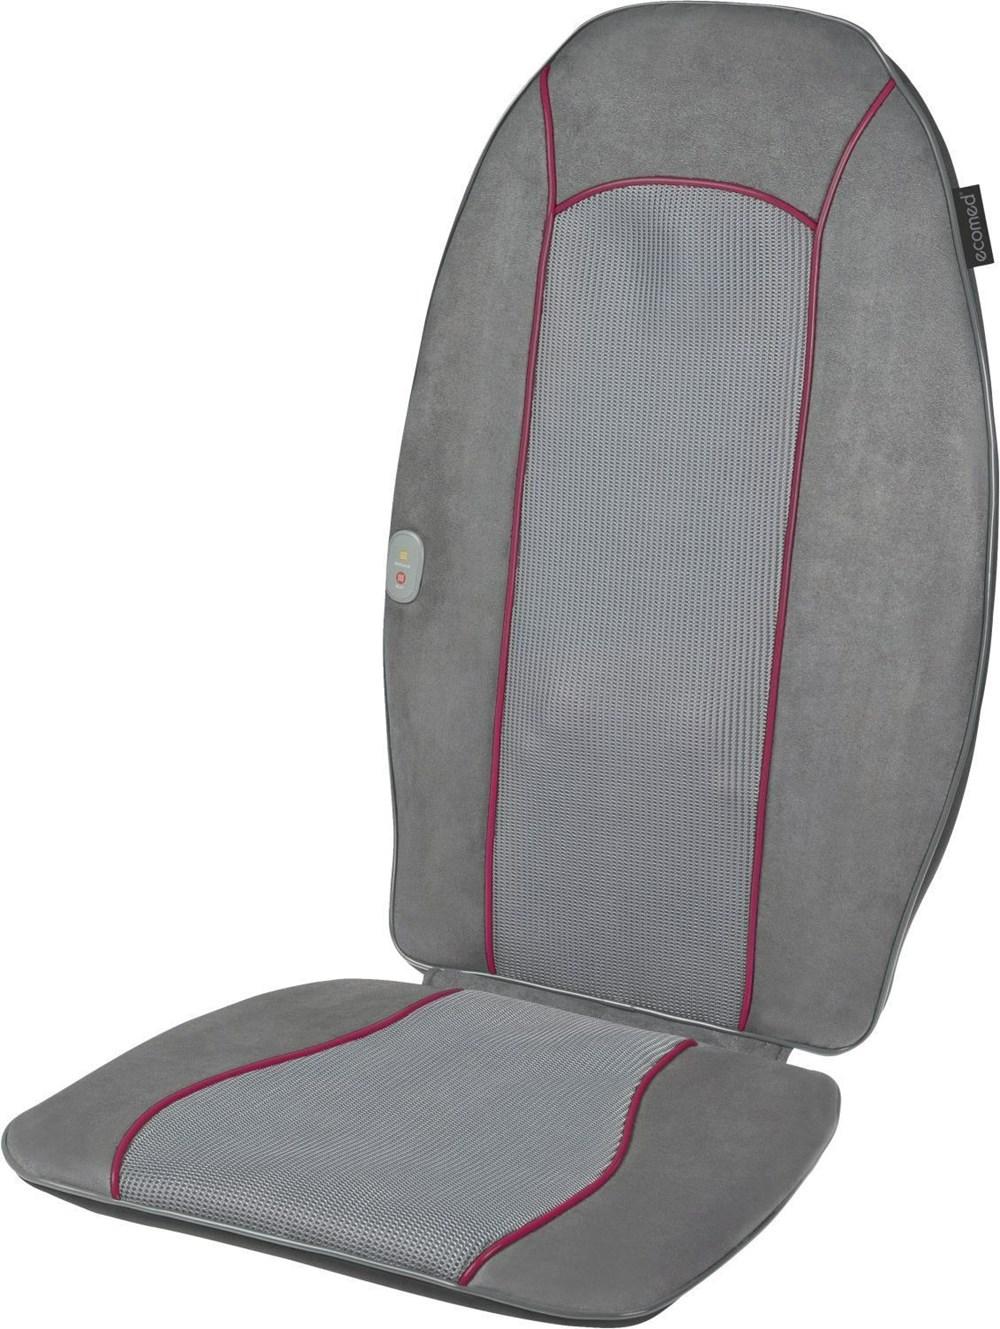 medisana mc 90e shiatsu massagesitzauflage massage entspannung computeruniverse. Black Bedroom Furniture Sets. Home Design Ideas